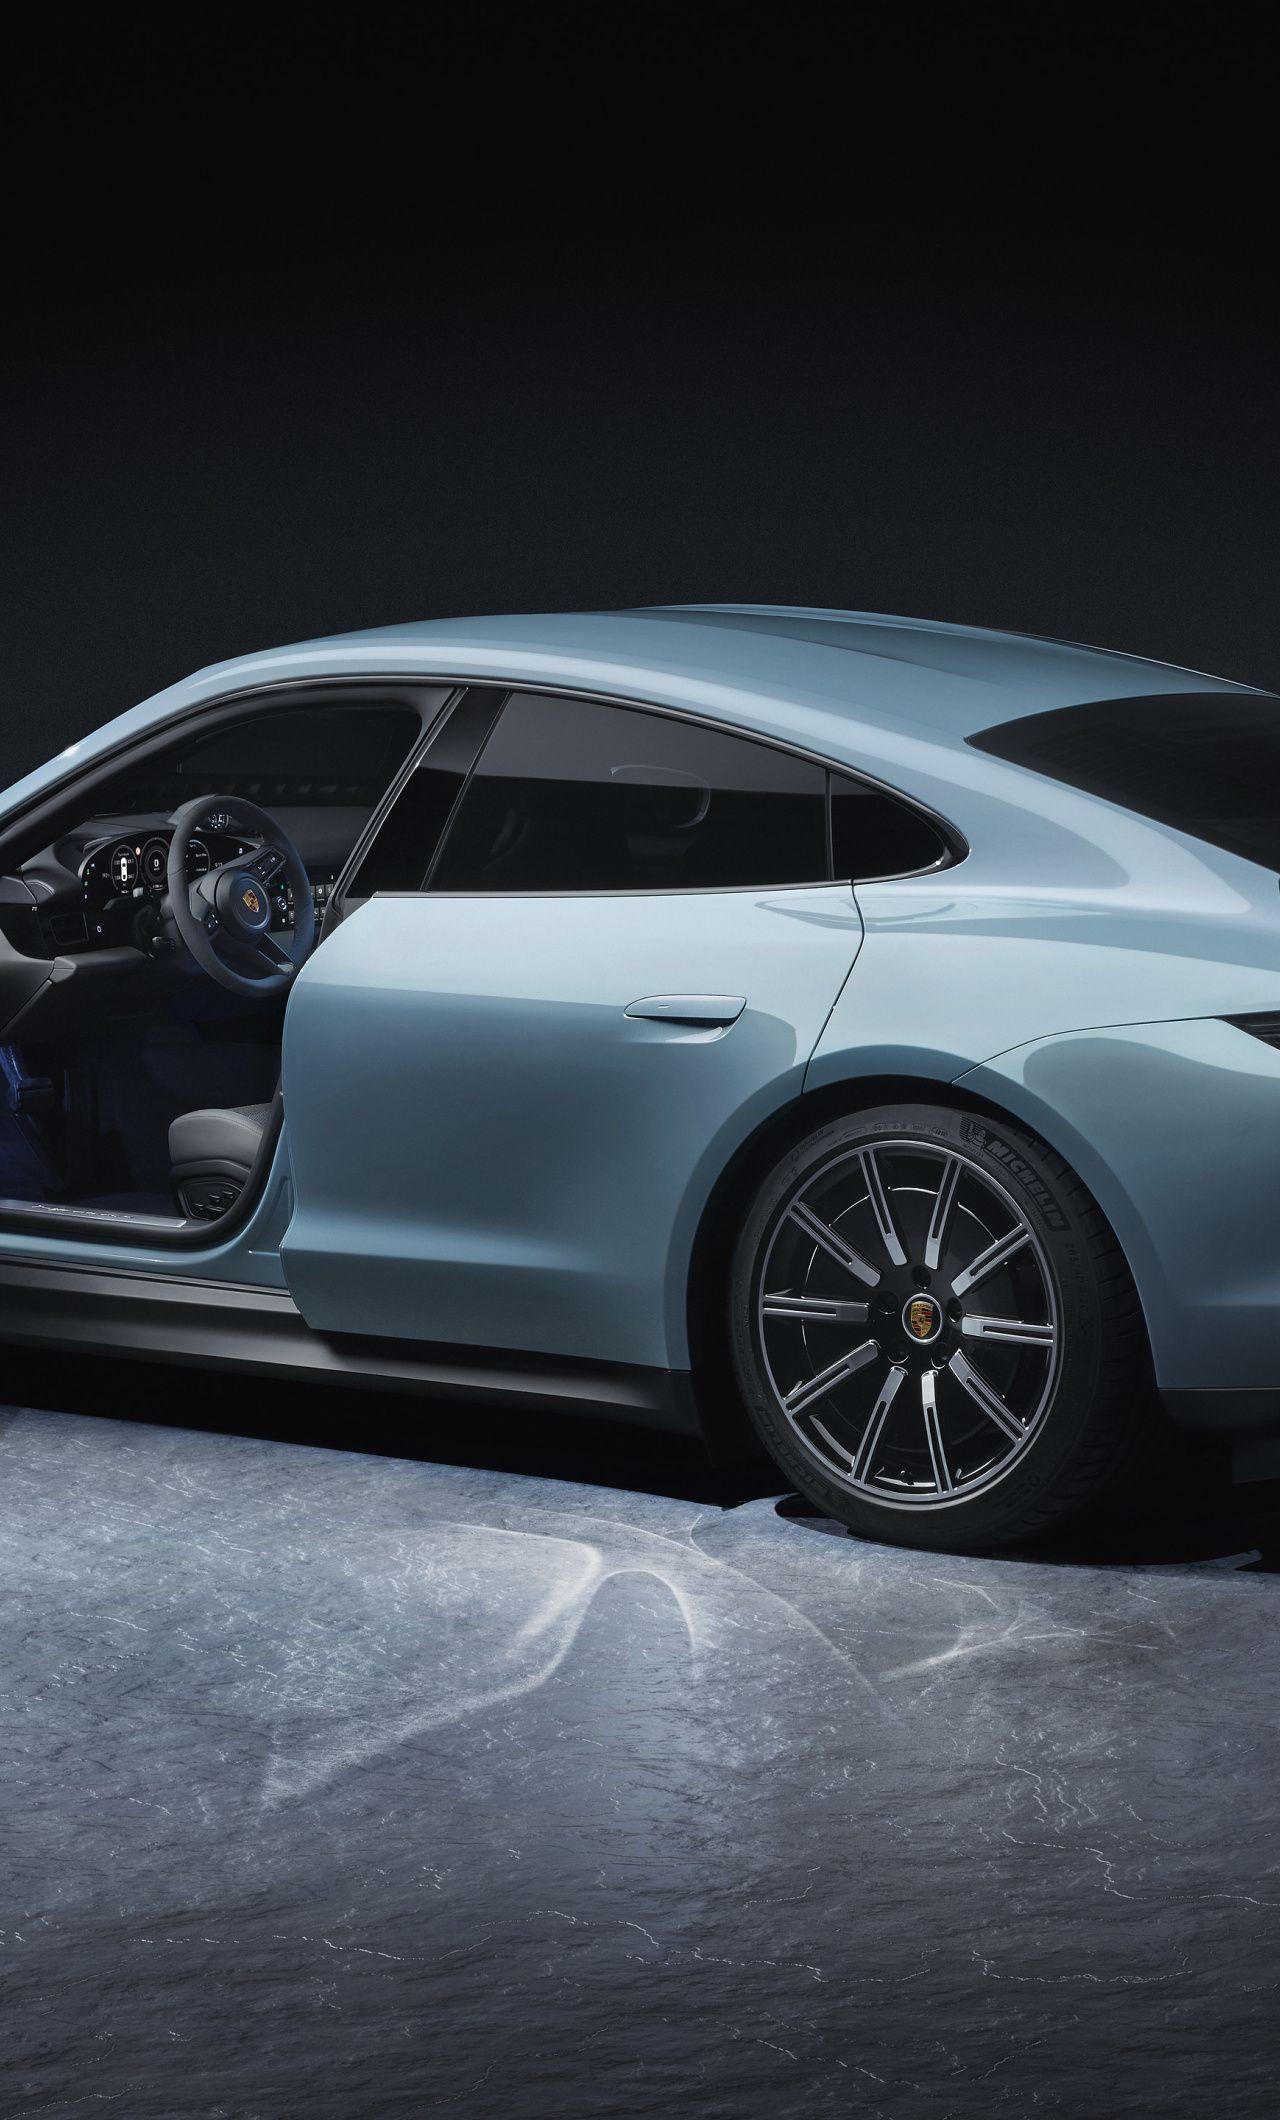 1280x2120 Porsche Taycan 4S, sideview, 2019 wallpaper